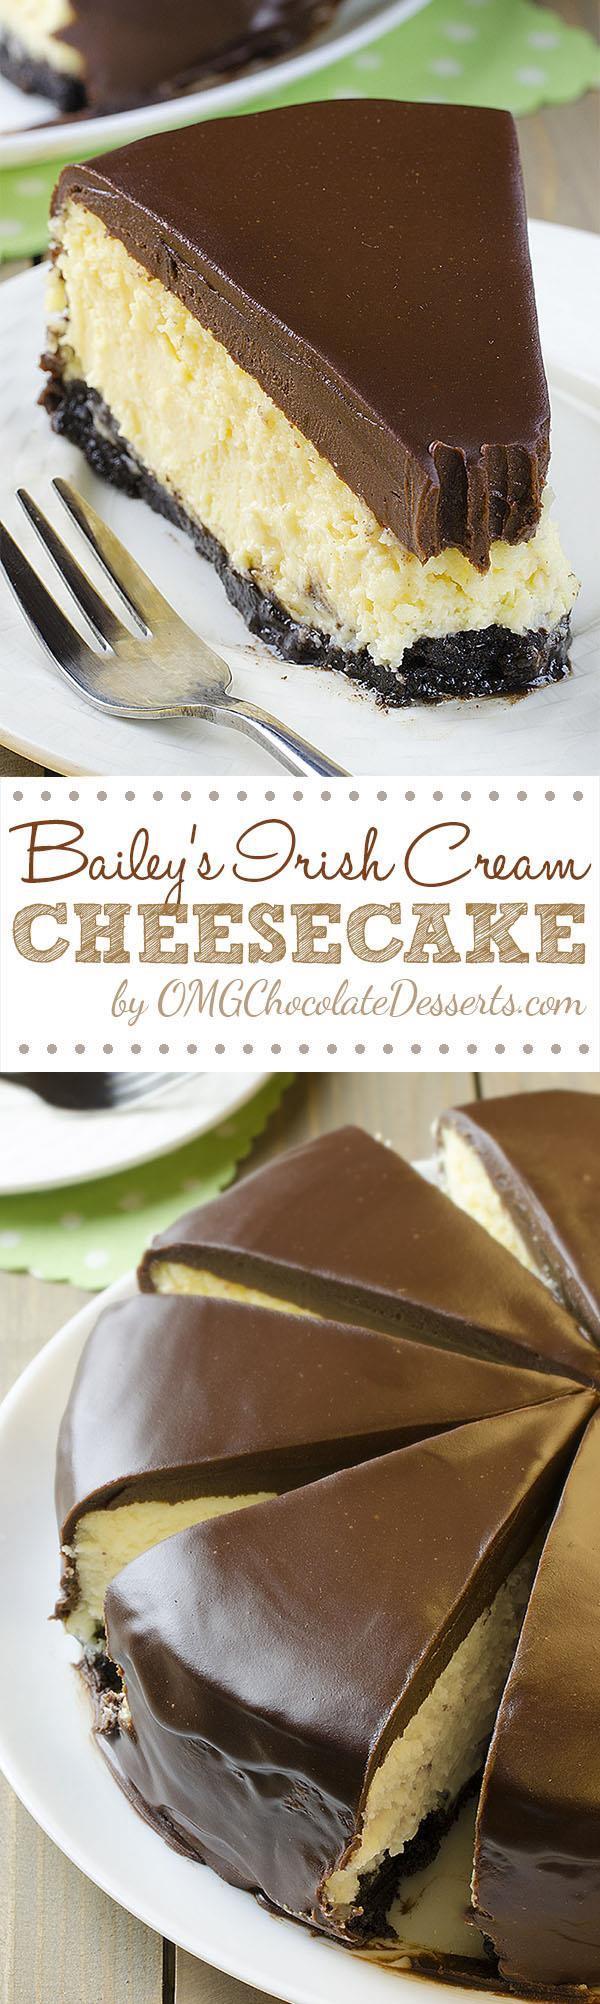 Baileys irish cream cake filling recipes